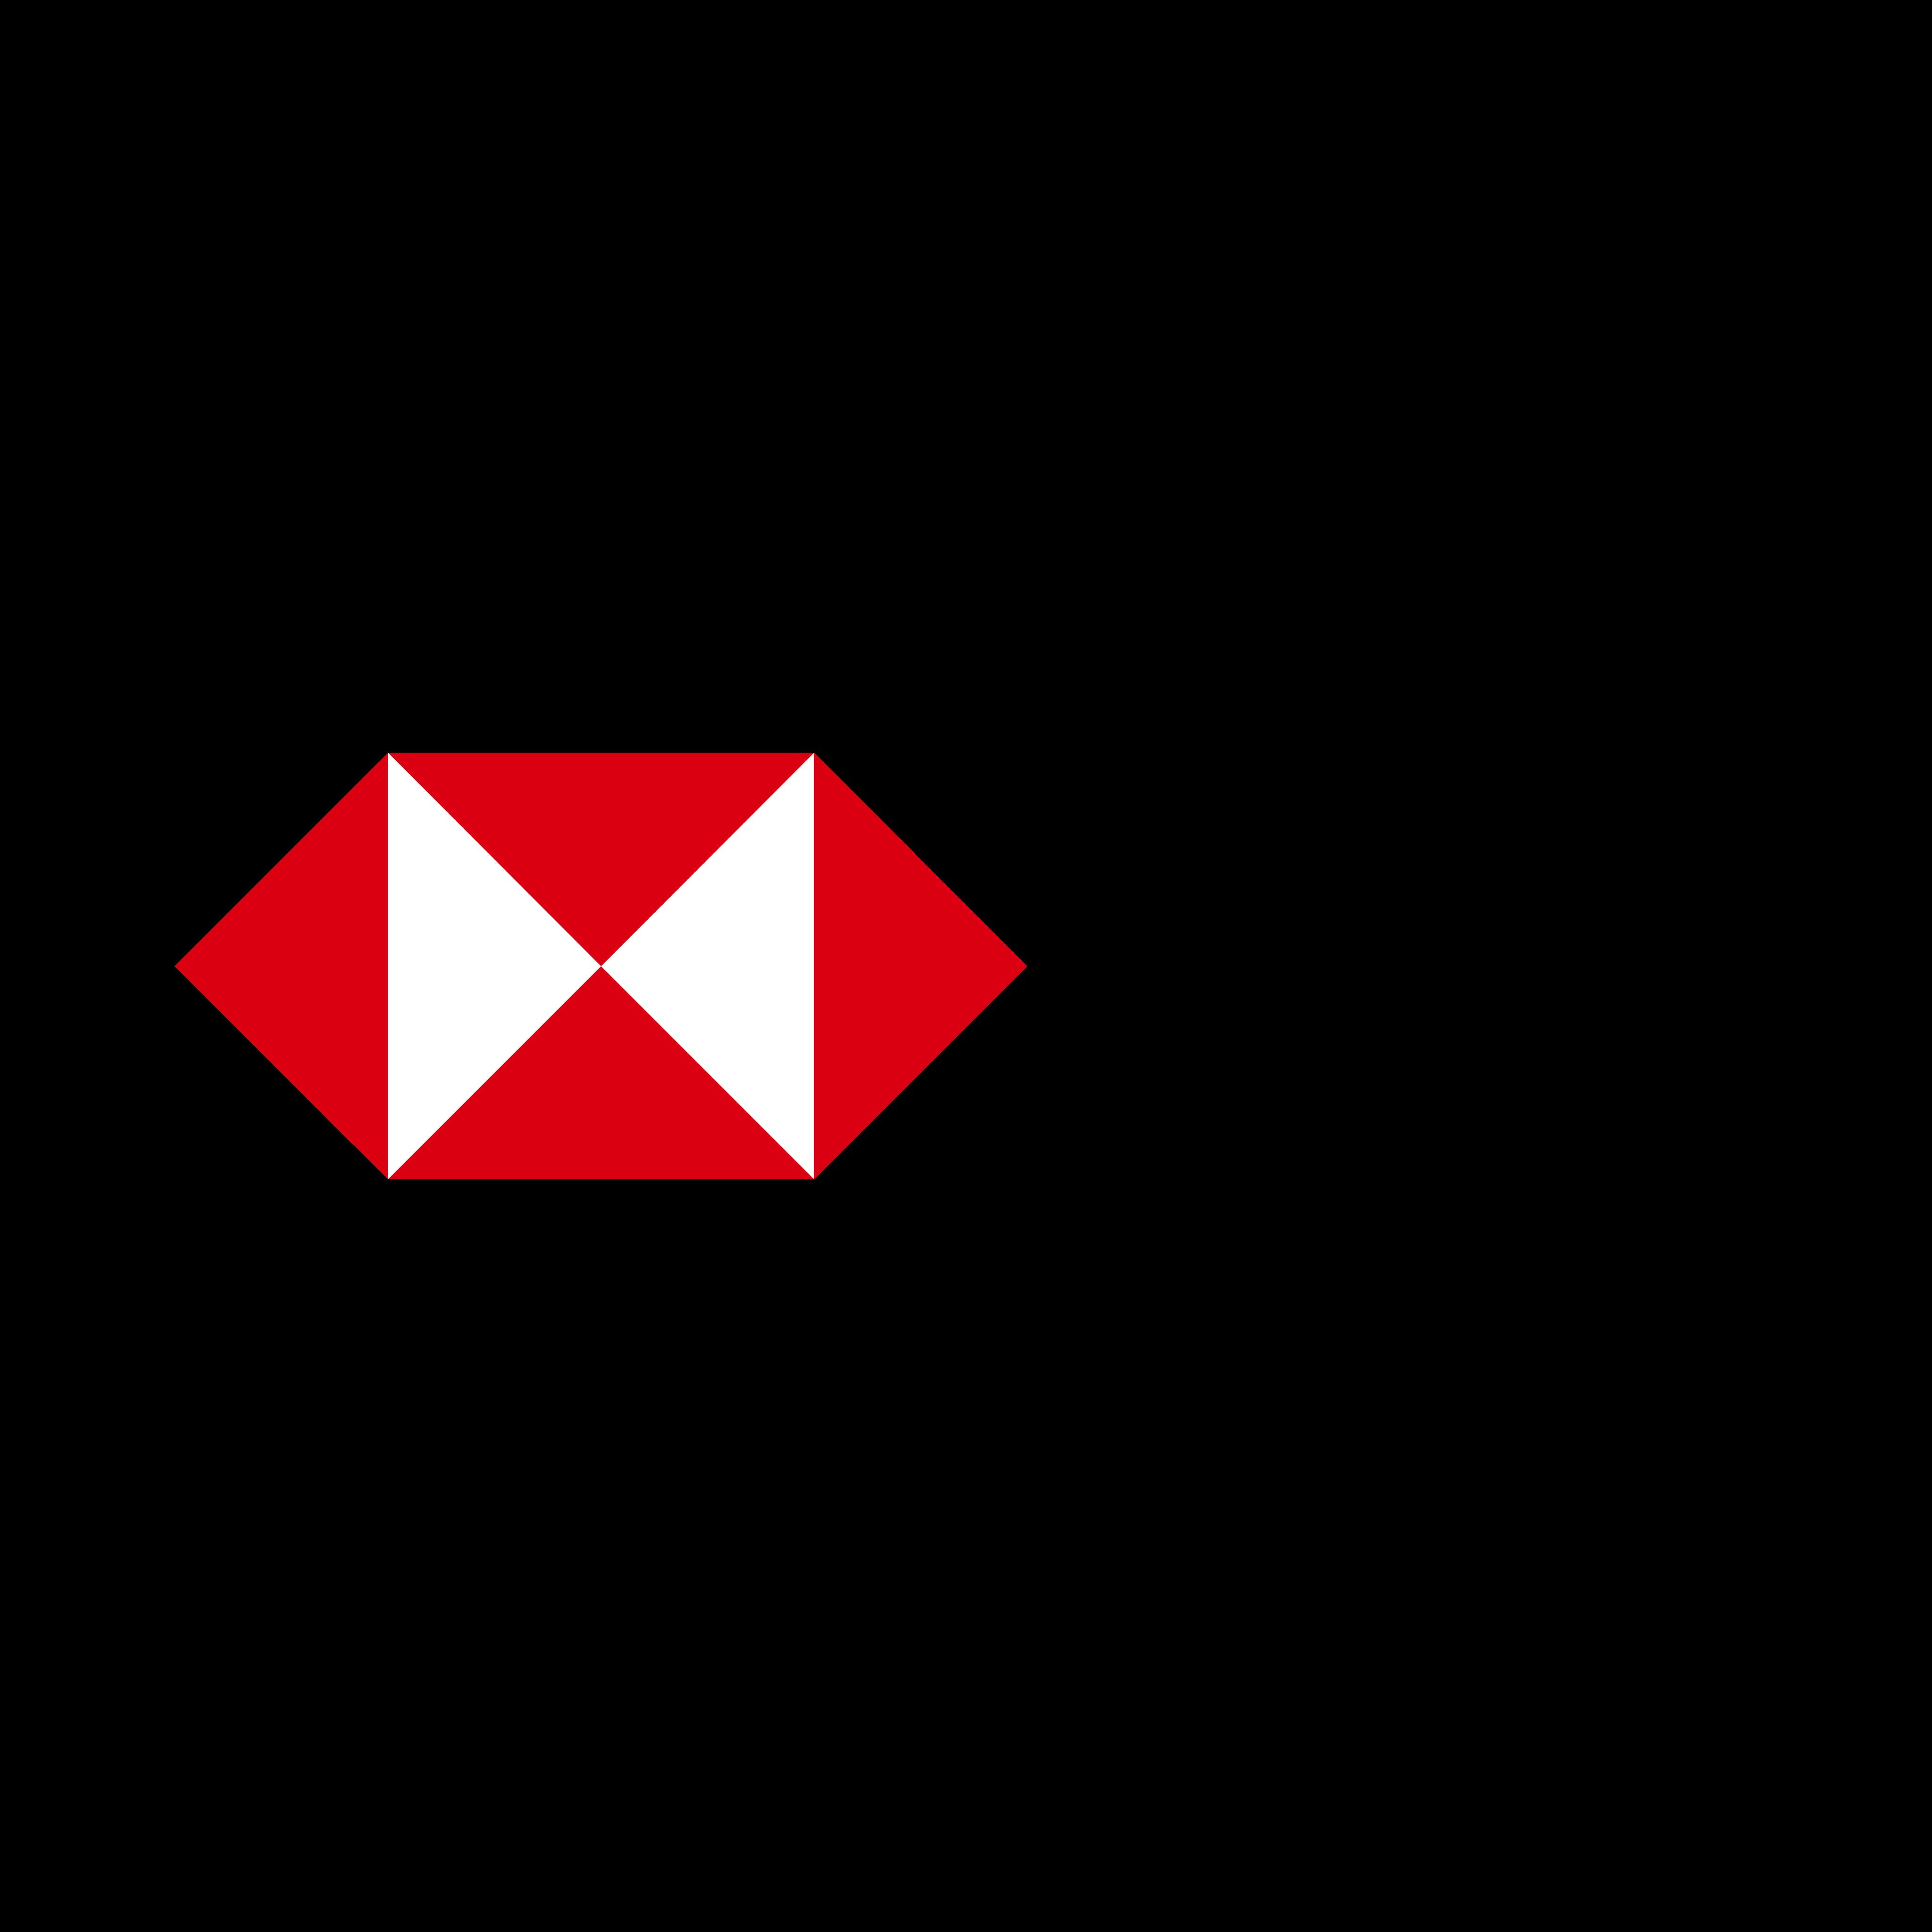 hsbc logo 0 - HSBC Logo